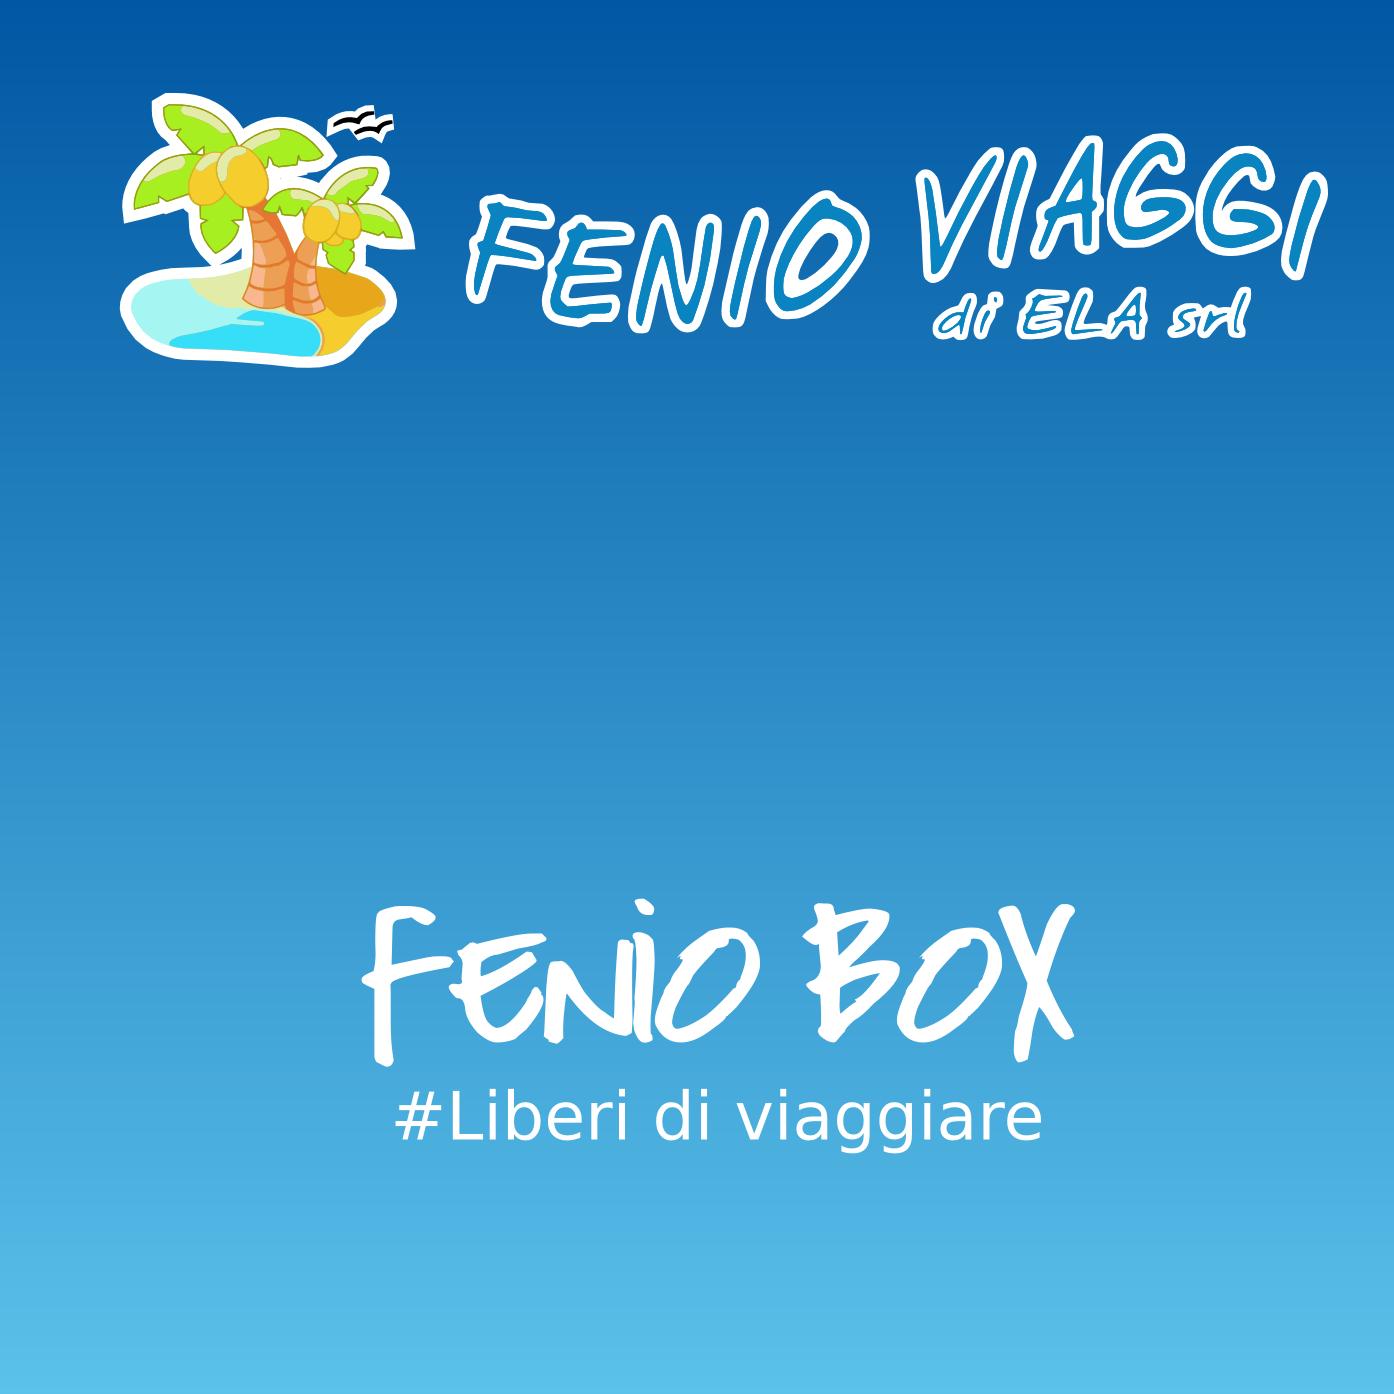 fenio-box-scatola-ideale